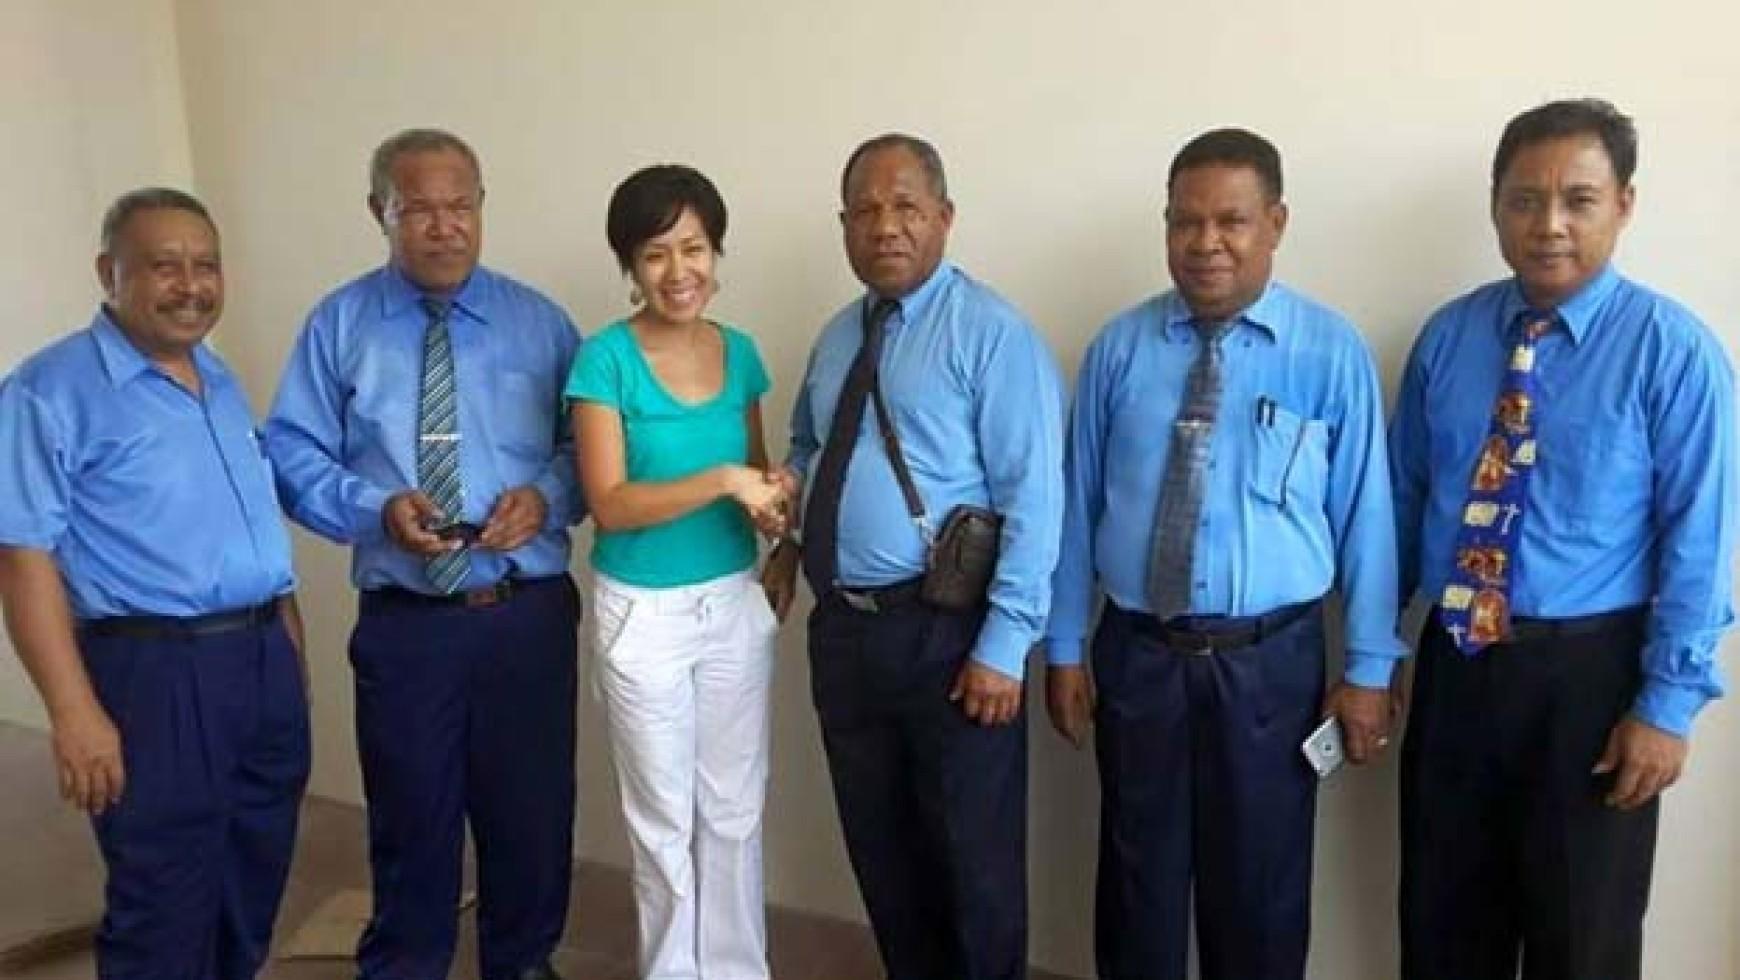 UEM WORKERS AND VOLUNTEERS STRENGTHENING PARTNERSHIP THROUGH EMPLOYMENT AND VOLUNTEER PROGRAMS